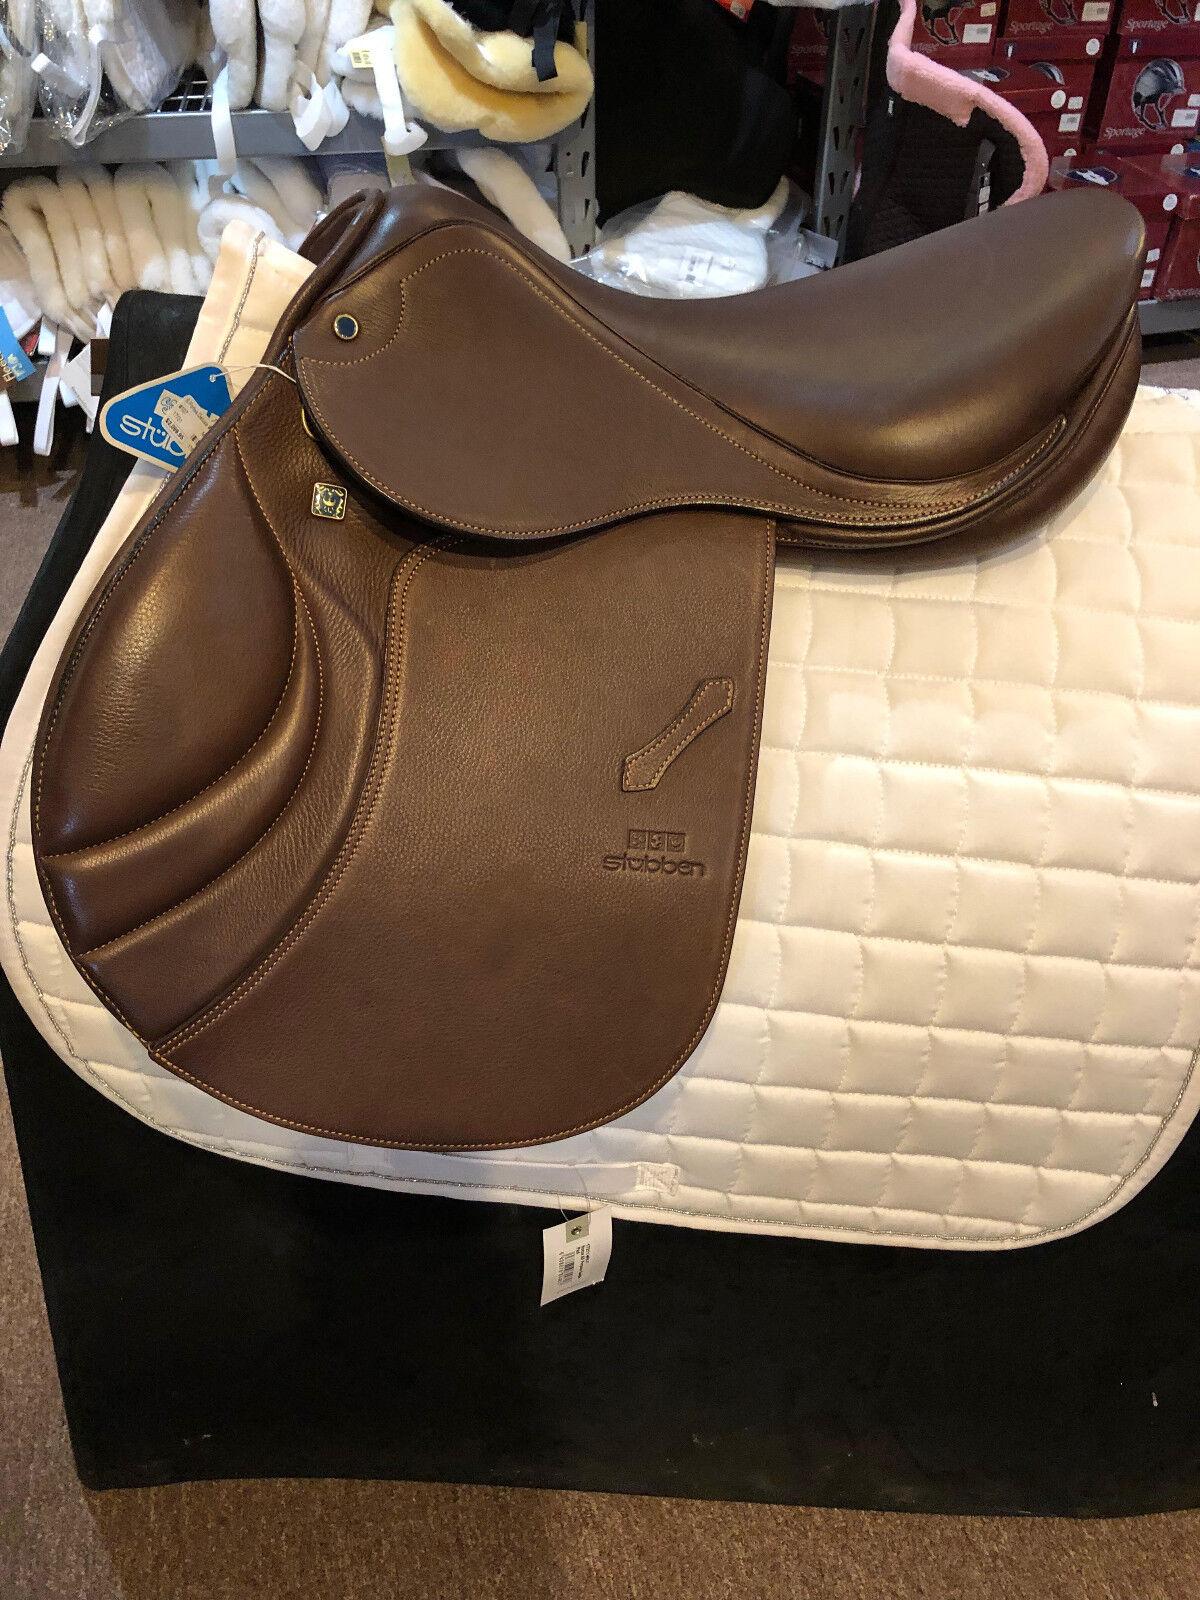 NEW Stubben S Portos Saddle Deluxe Leather 17 31cm  Mocca